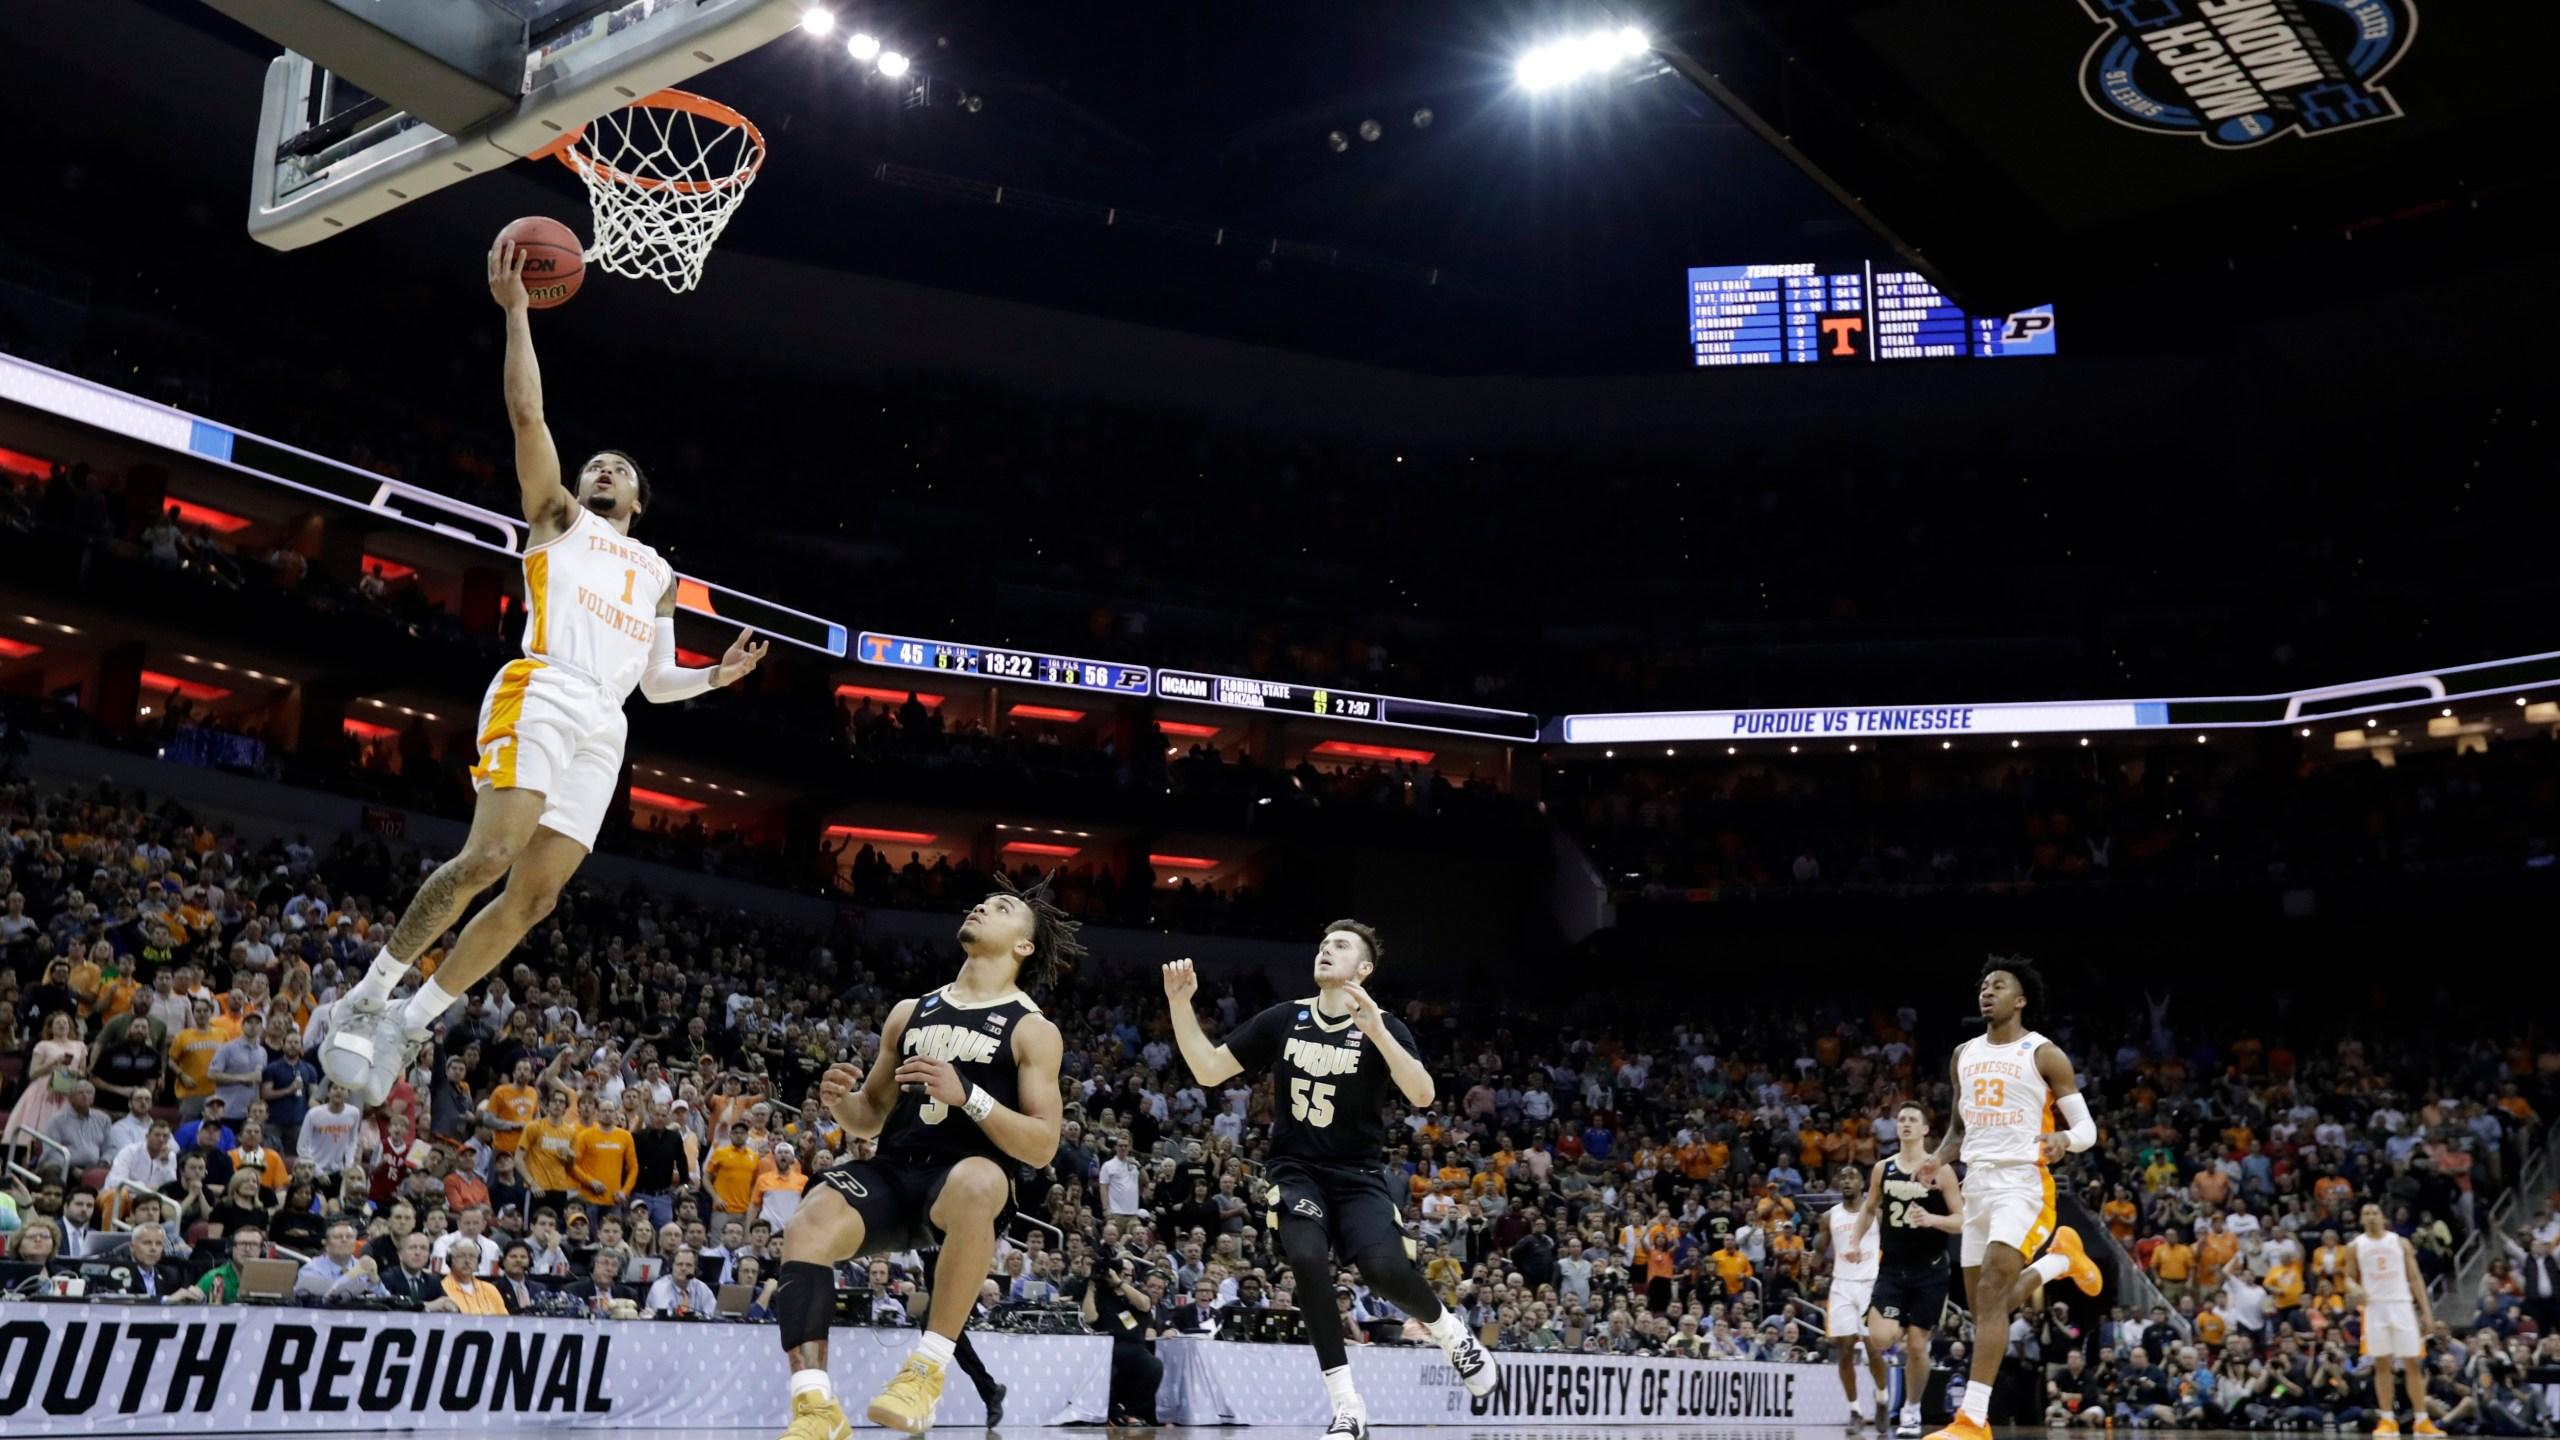 NCAA_Purdue_Tennessee_Basketball_58908-159532.jpg33915344